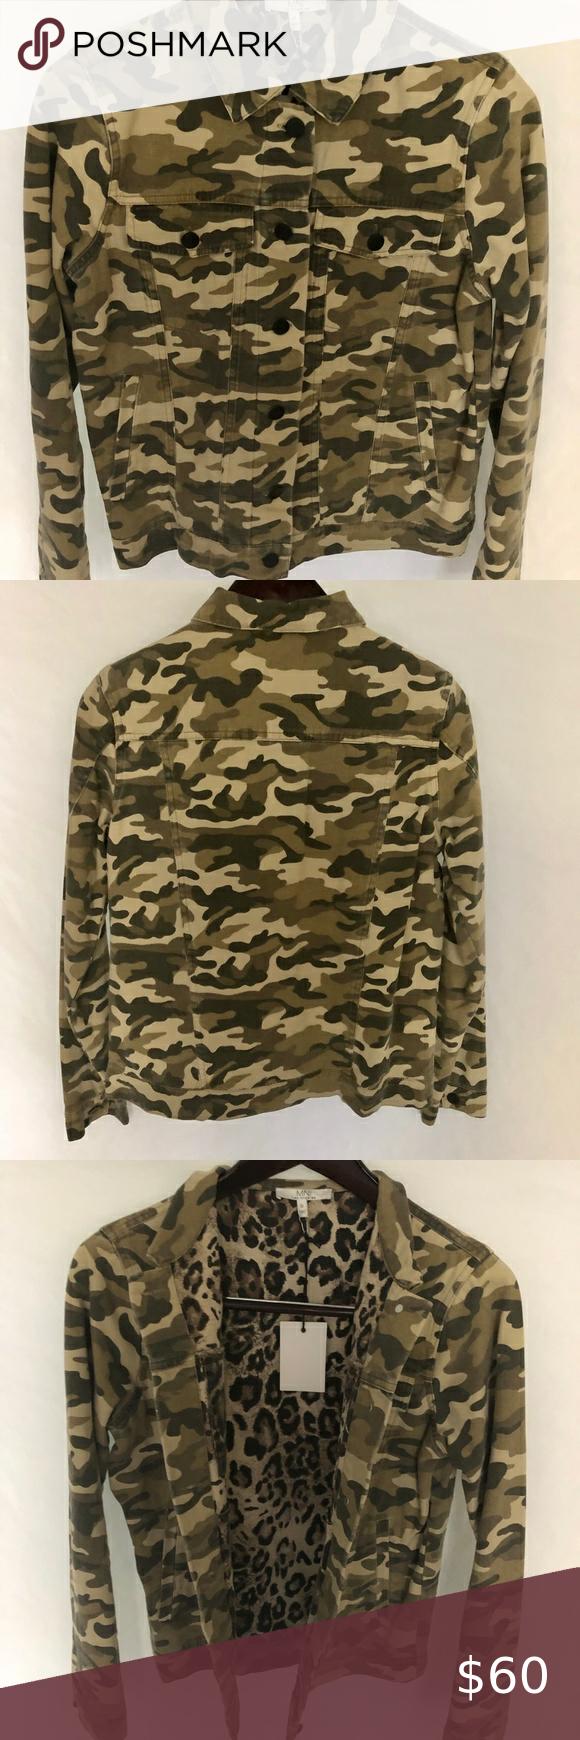 M N I Los Angelos Camo Jean Jacket Nwt Size Small Camo Print Jacket Jean Jacket Camo Denim Jacket [ 1740 x 580 Pixel ]